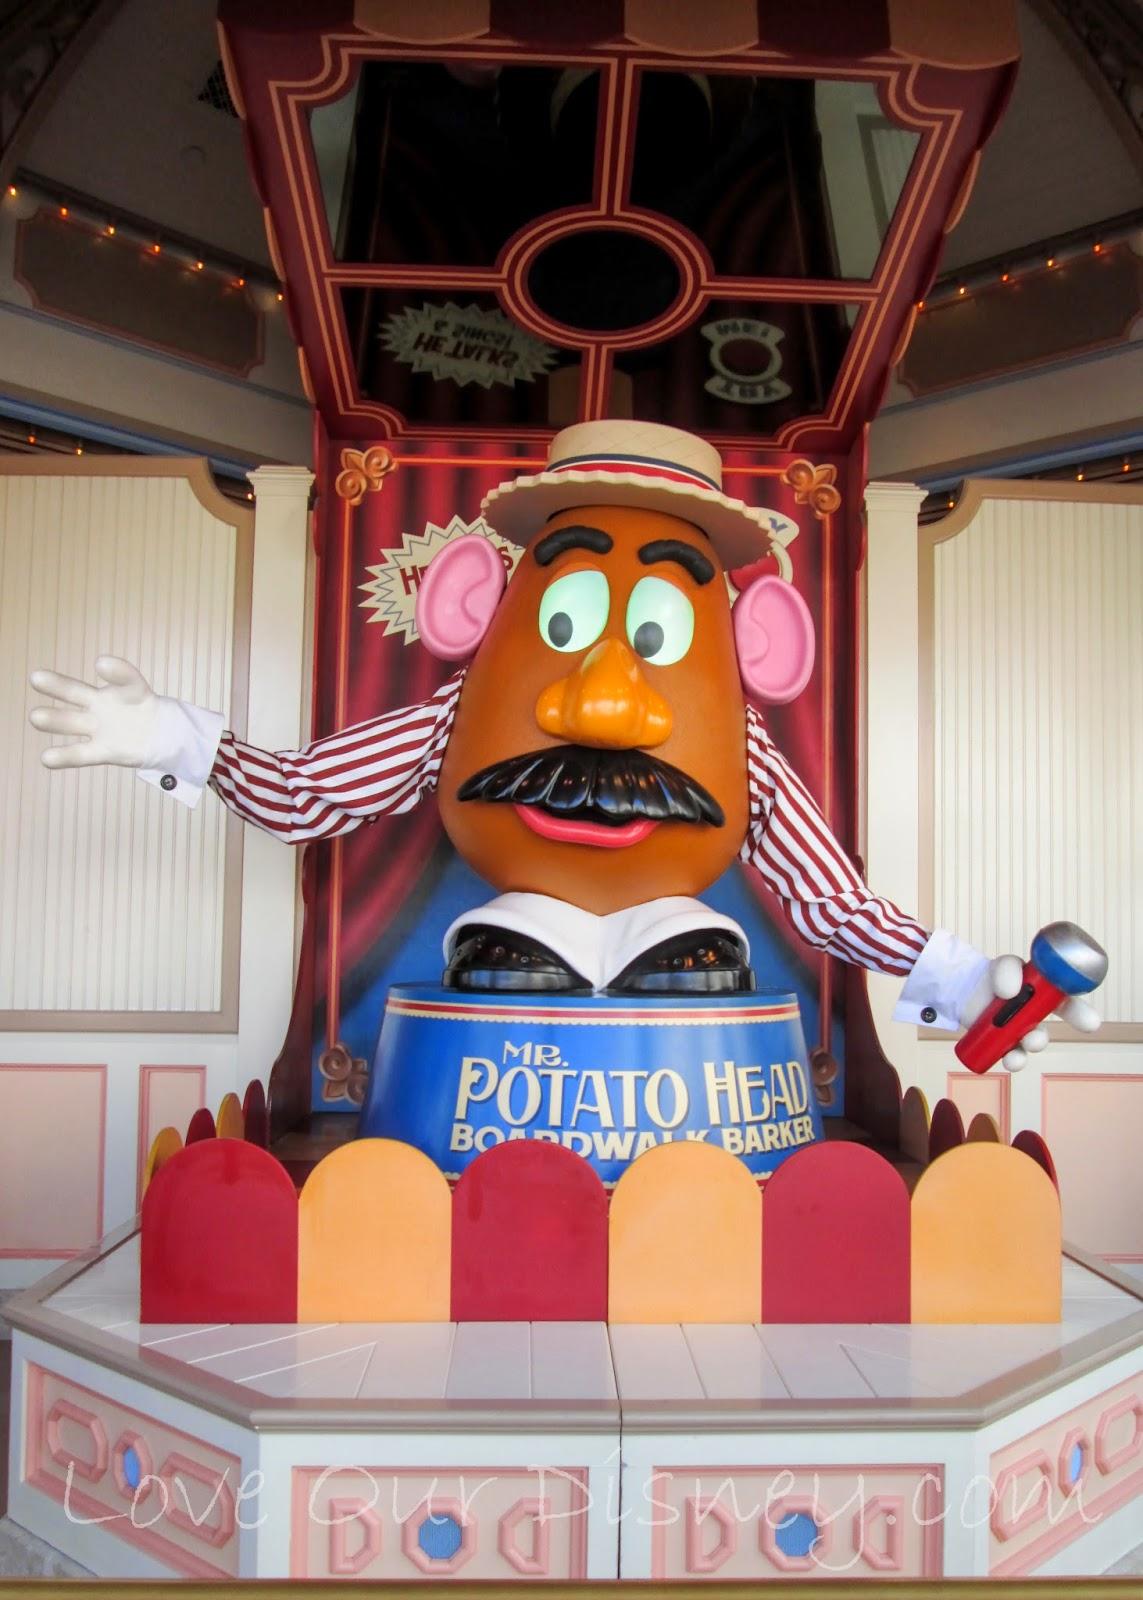 10+ best rides for preschoolers at the Disneyland Resort. LoveOurDisney.com